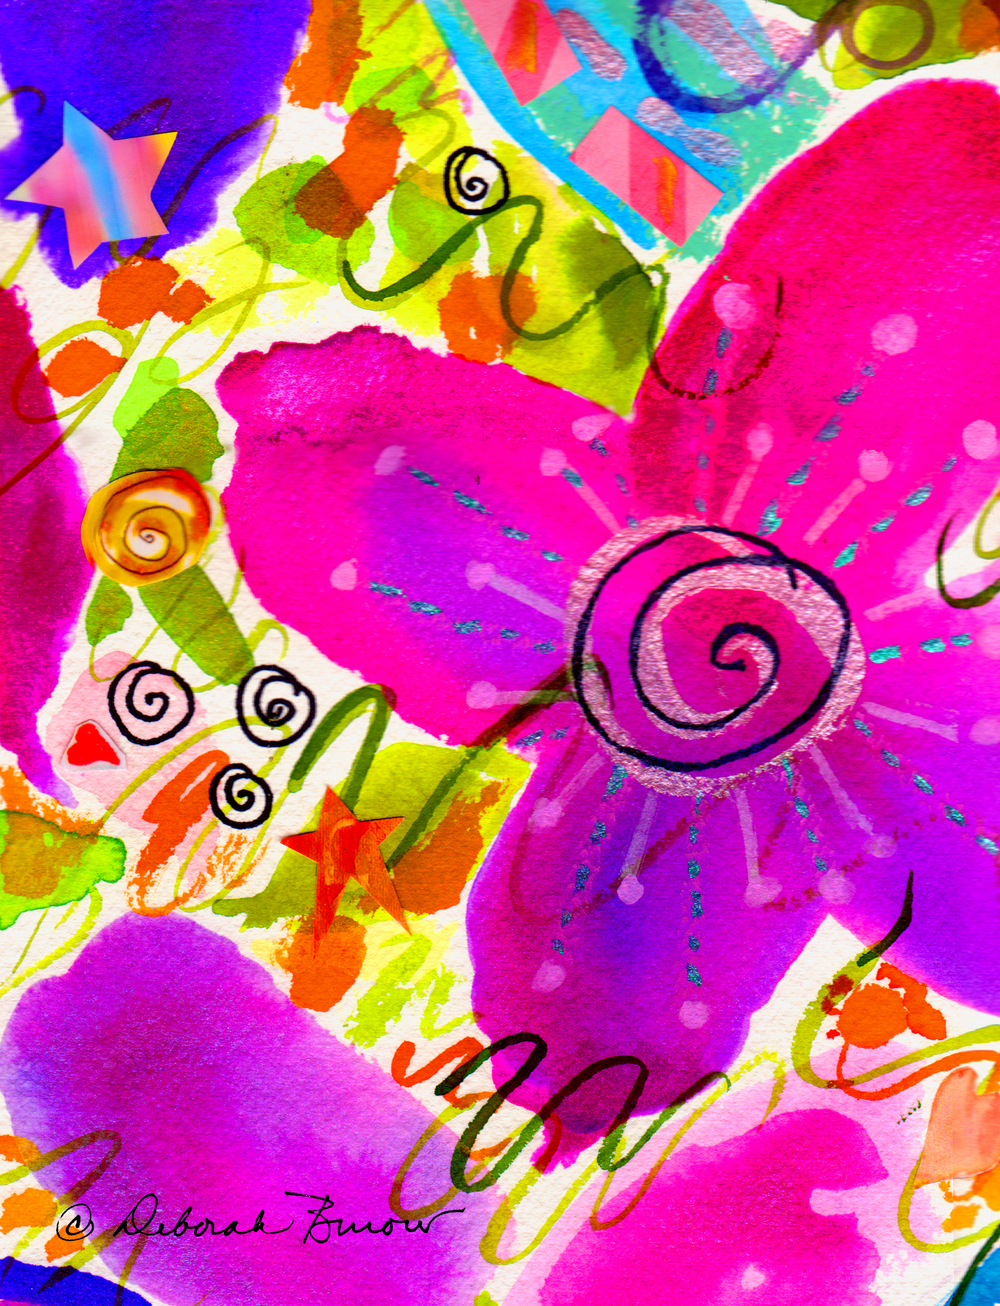 Flowers and Swirls and Stars